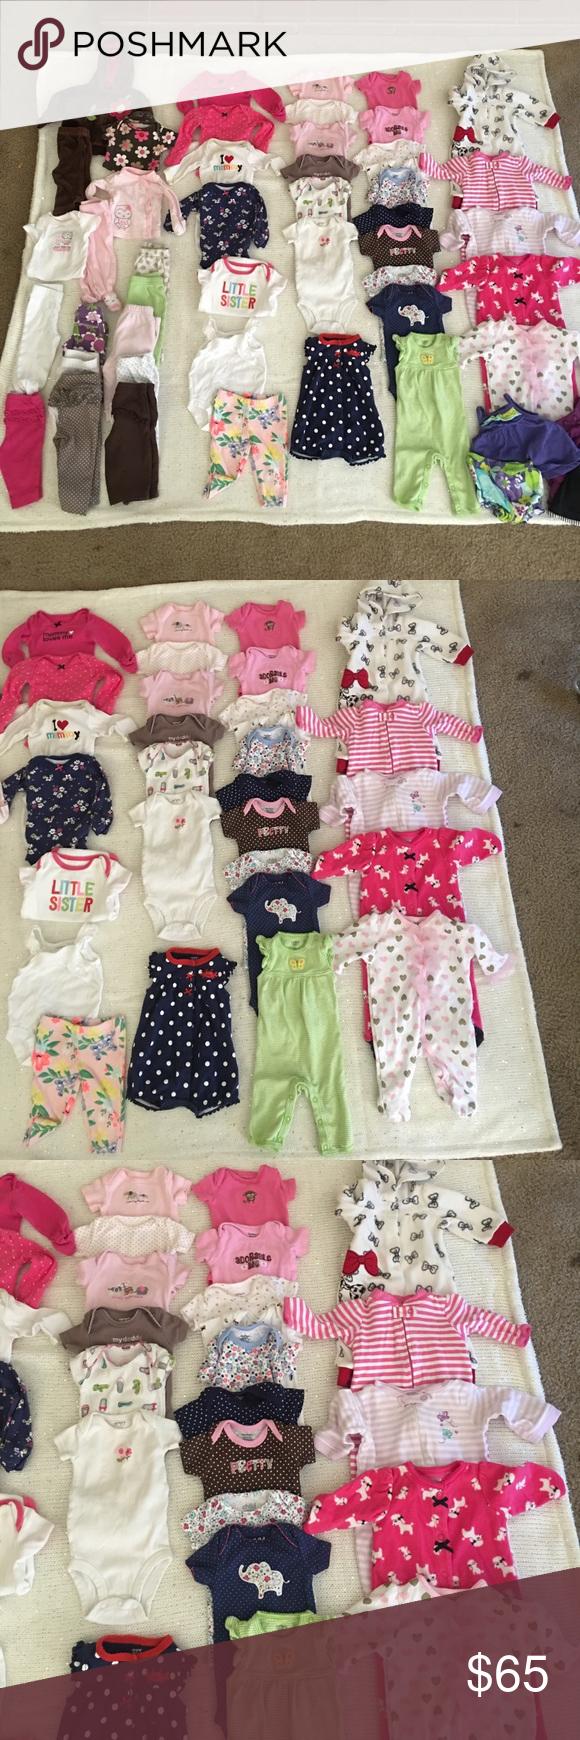 Baby Girl Clothes Bundle Lot Newborn 50 Pieces Baby Girl Bundle Lot